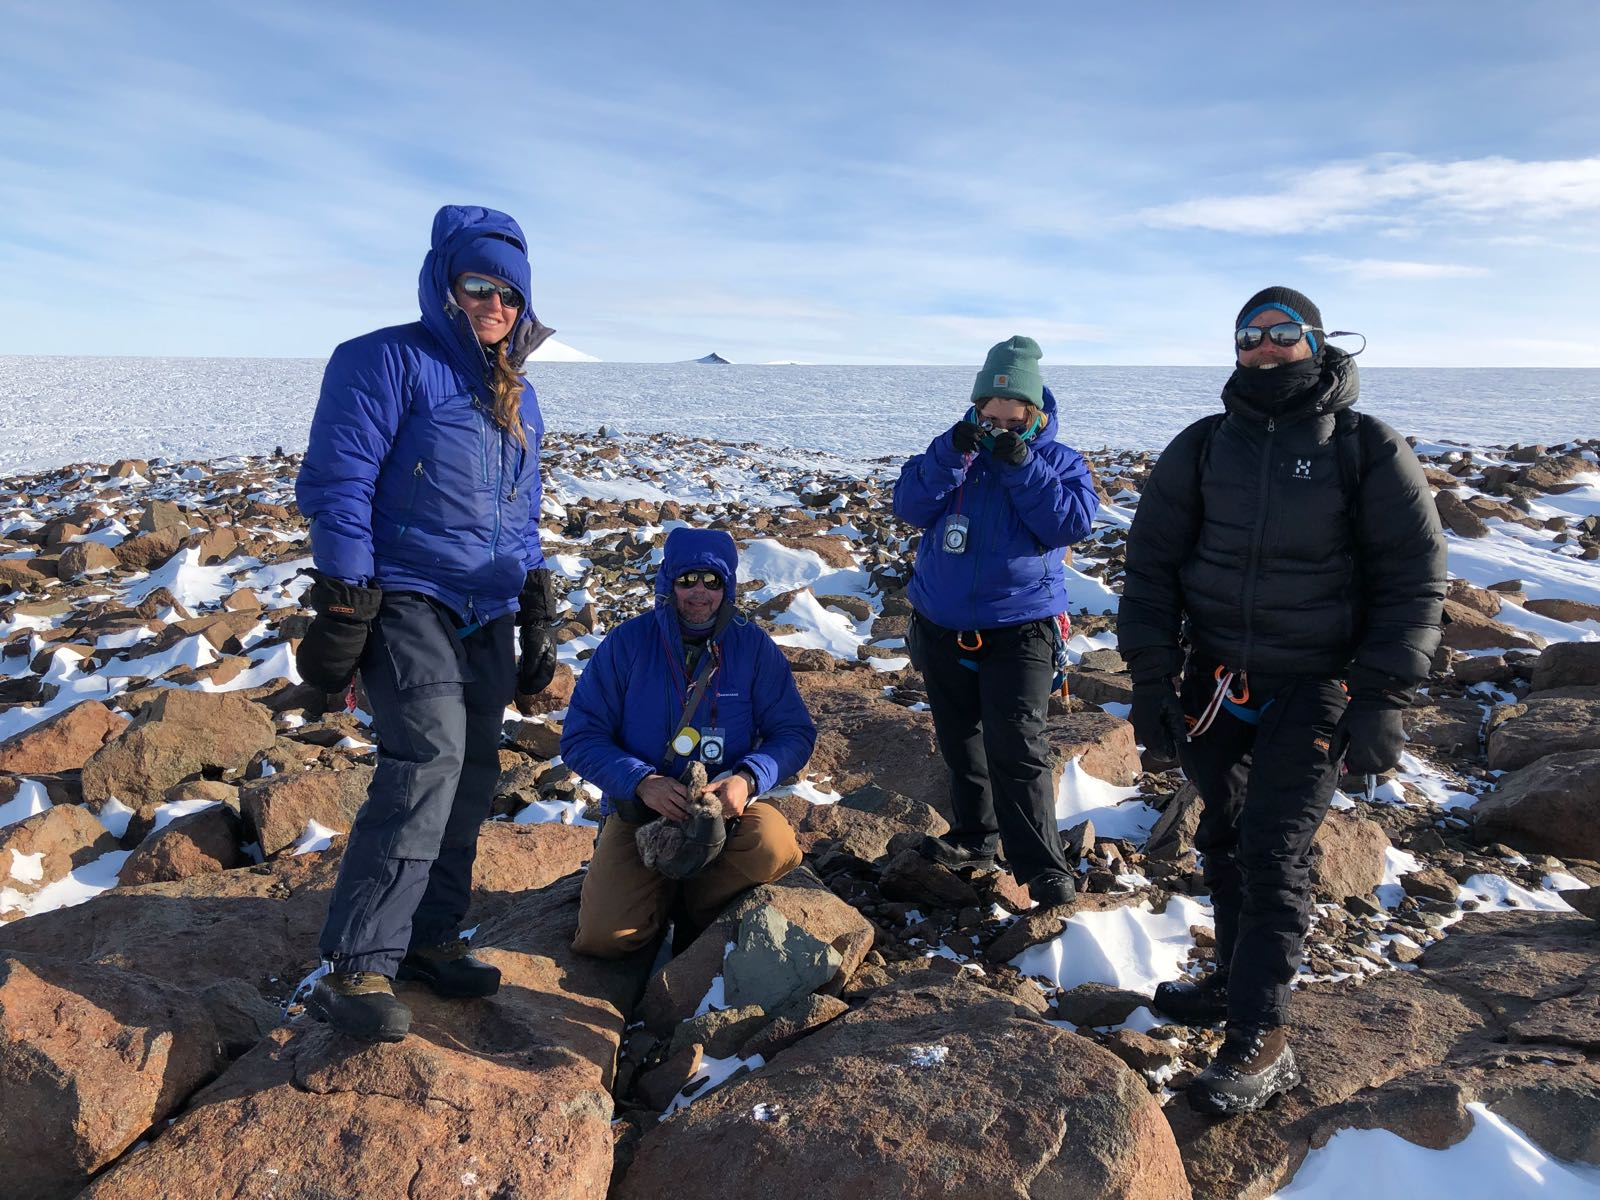 Forskare bland klippblock